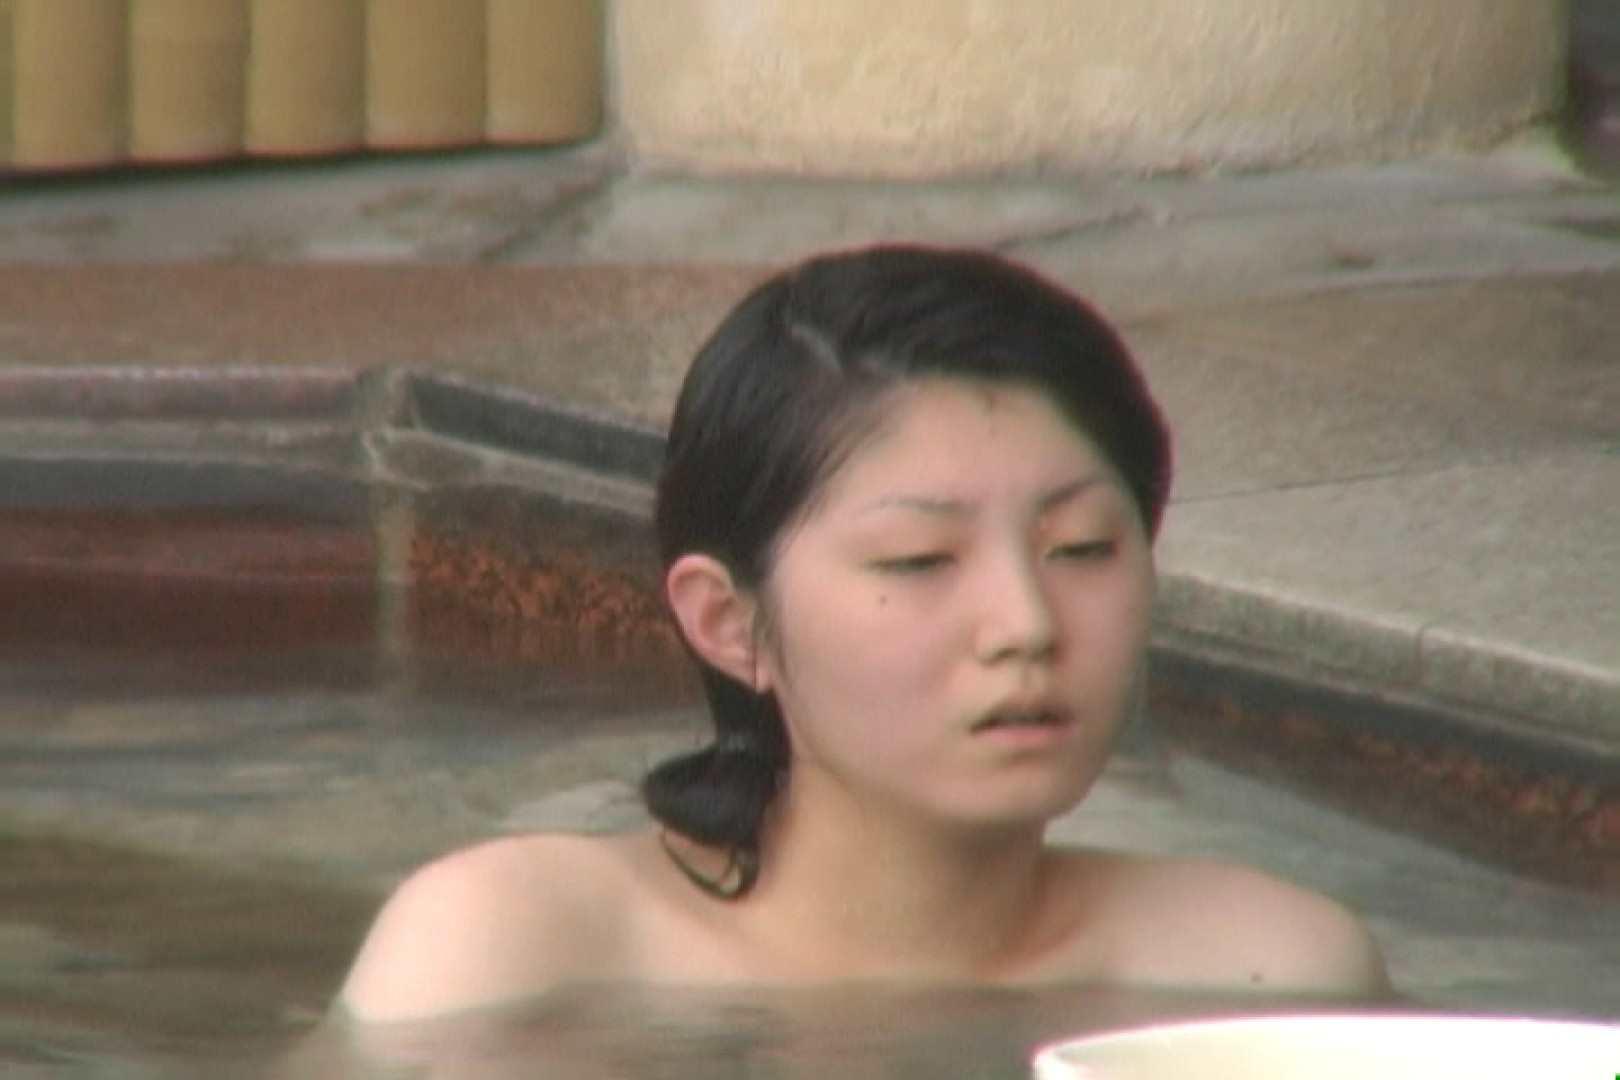 Aquaな露天風呂Vol.579 盗撮 AV無料 52画像 41